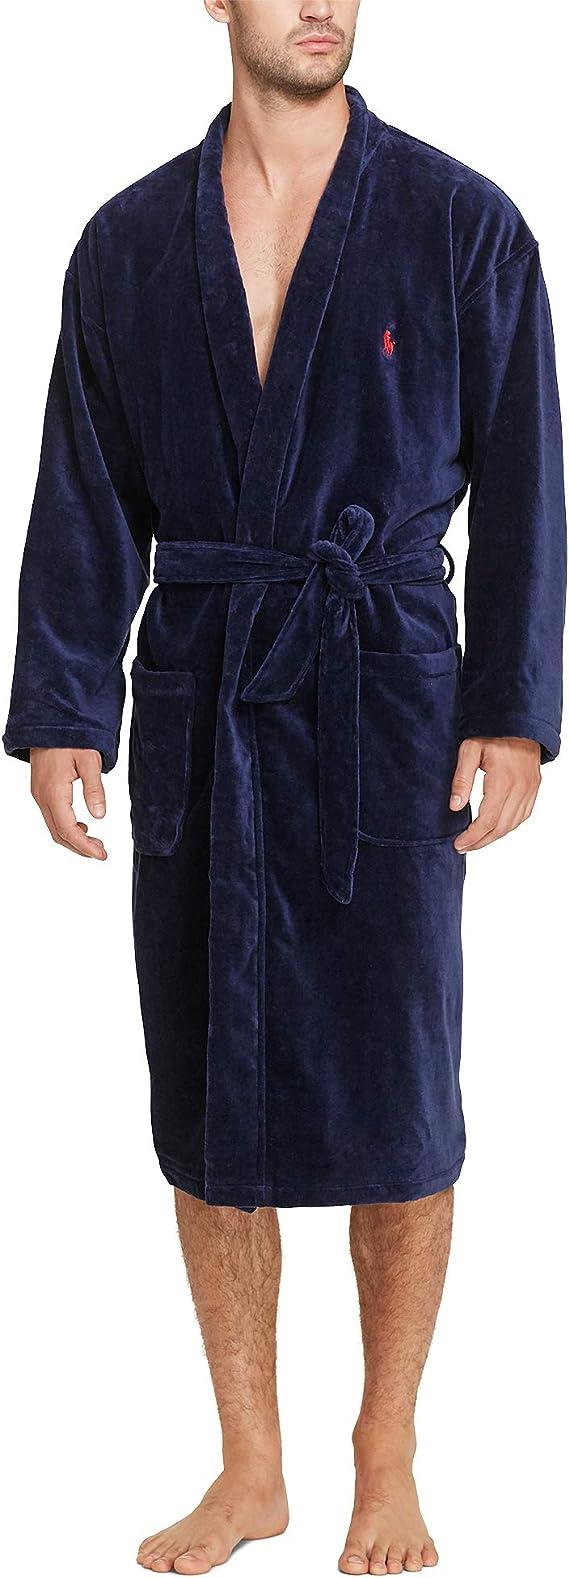 Polo Ralph Lauren Mens Terry Shawl Robe